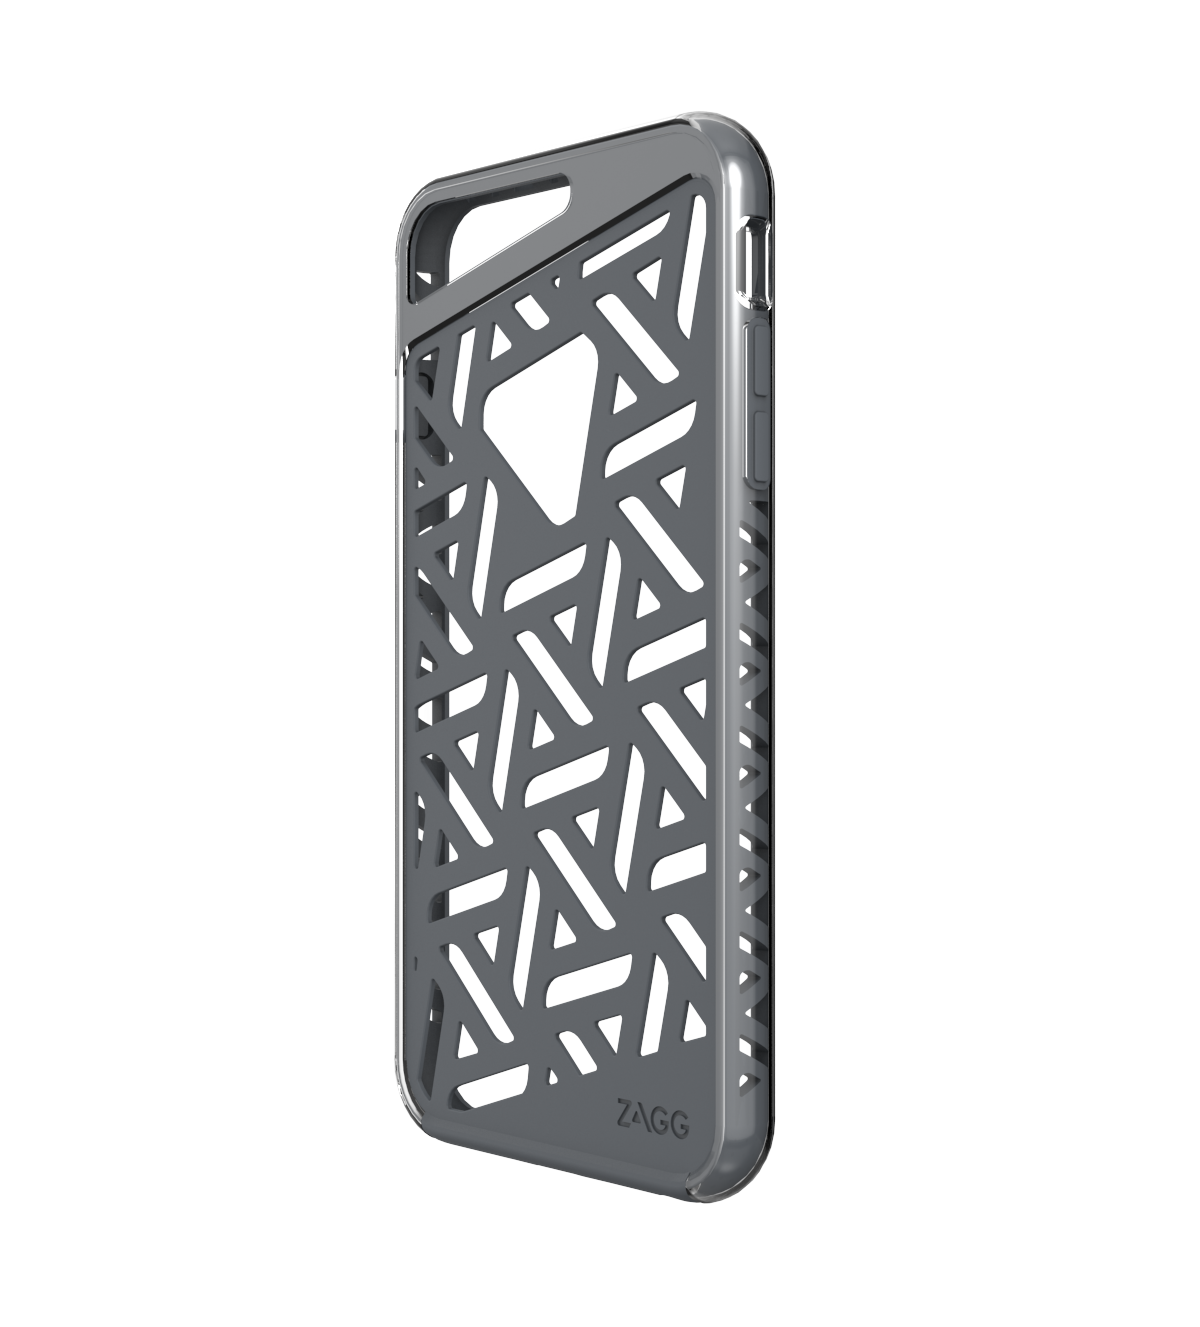 DropGuard for the Apple iPhone 6 Plus/6s Plus